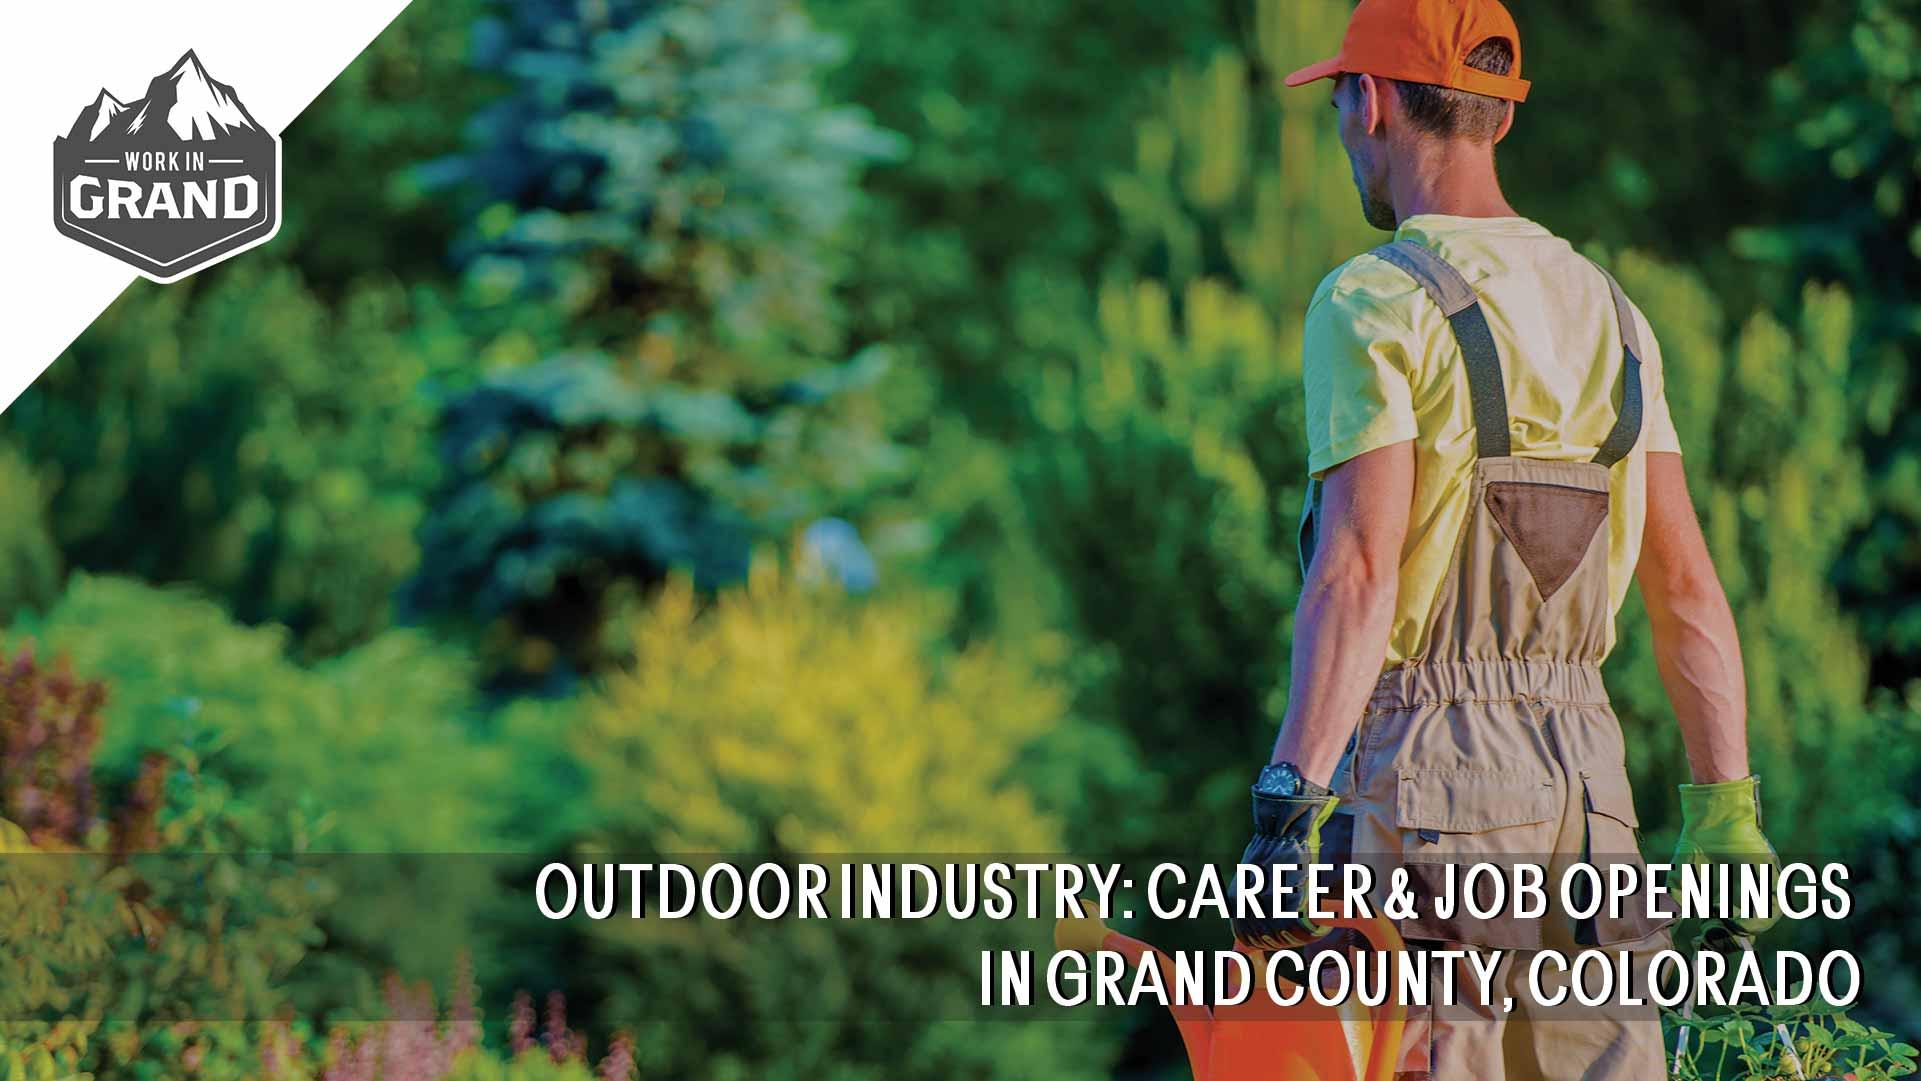 Outdoor Industry - Career & Job Openings in Grand County, Colorado